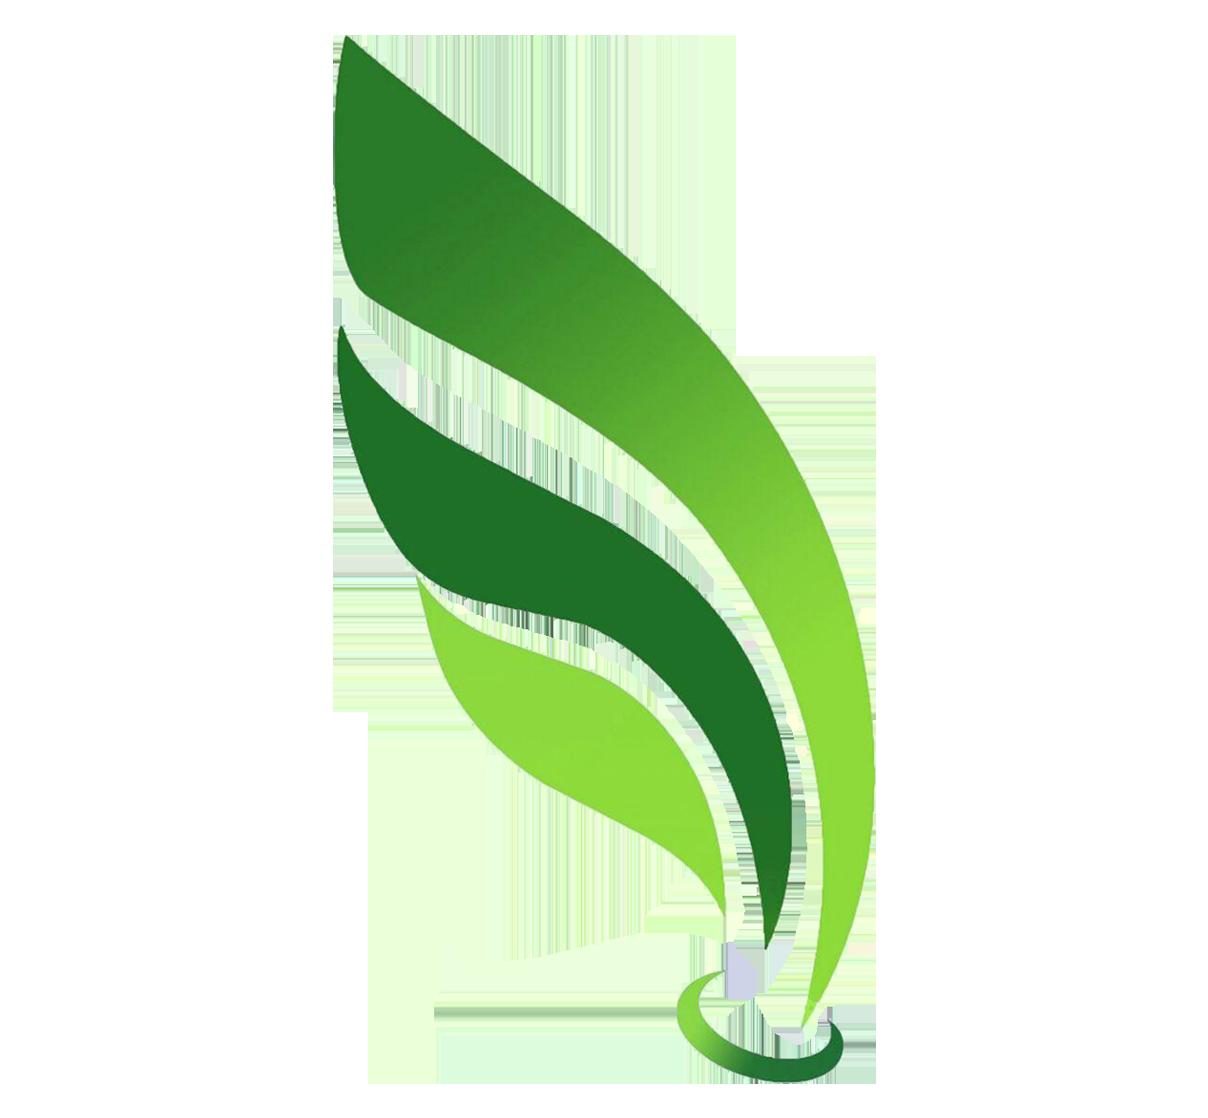 کاغذ سبز آذربایجان